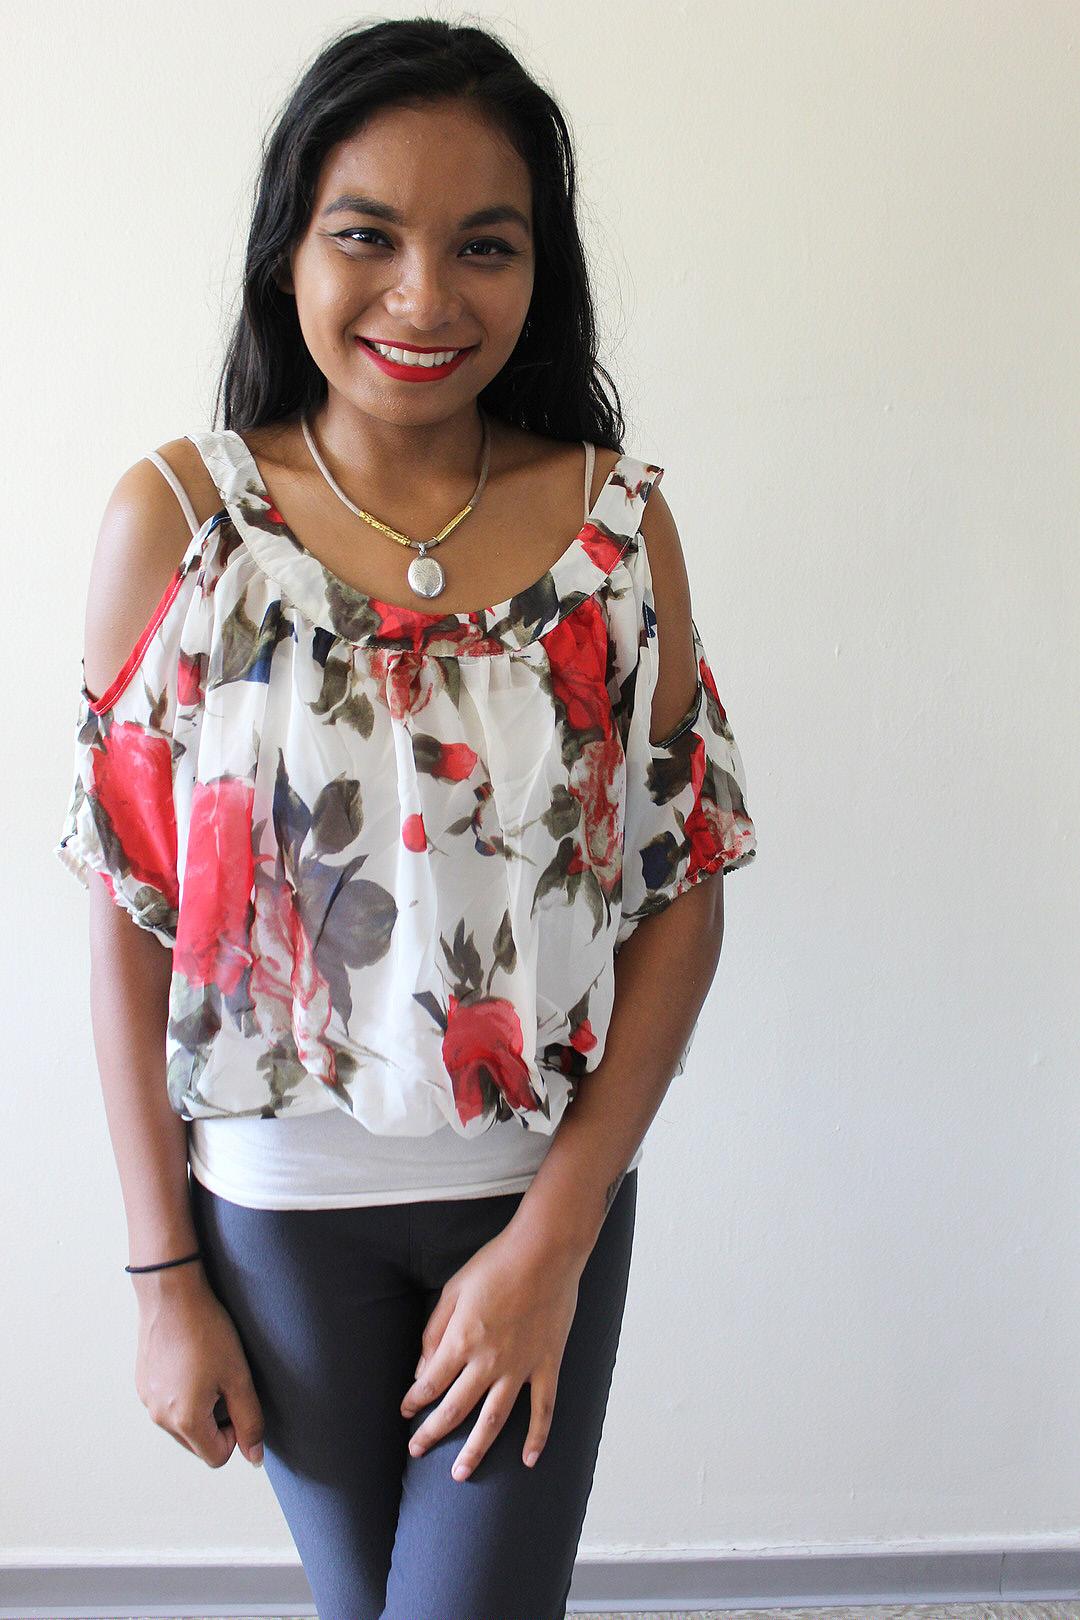 Floral-Shirt-Rosegal-Fall-Style-Blogger-LINDATENCHITRAN-1-1616x1080